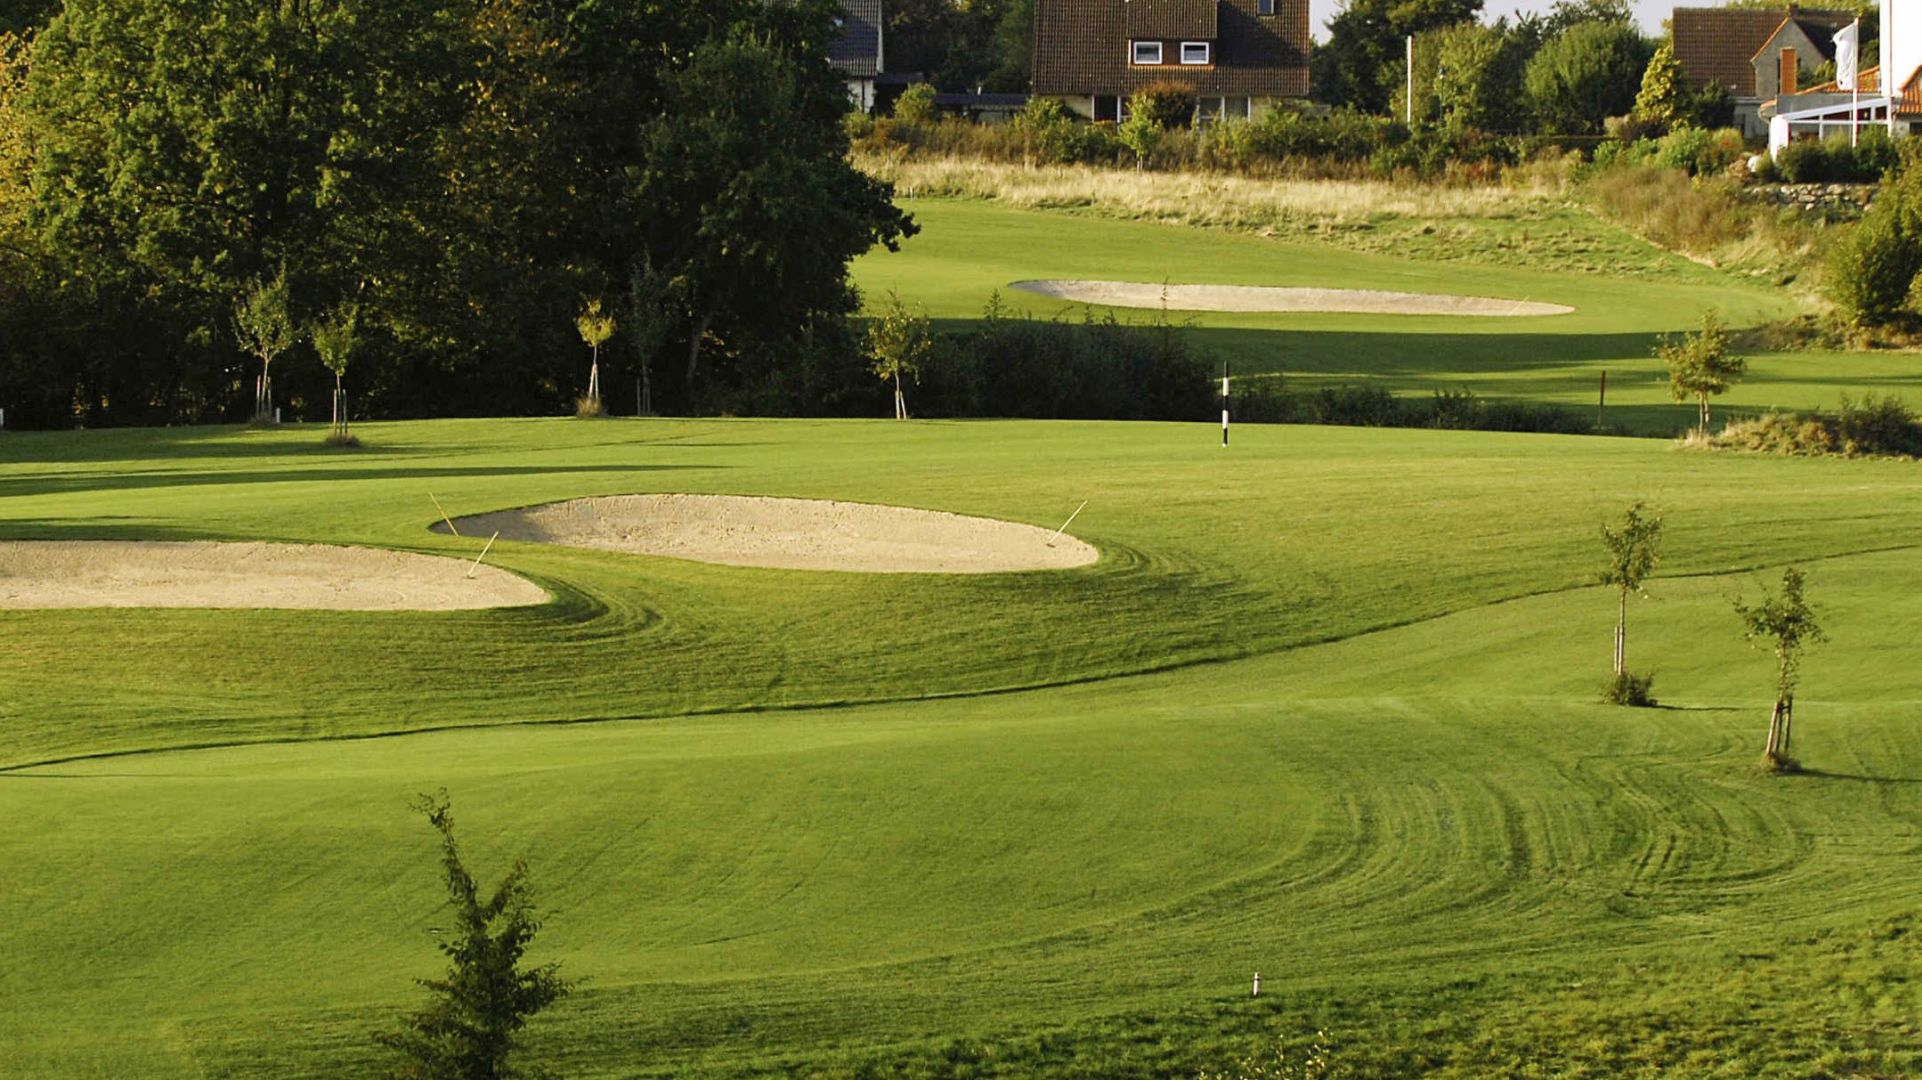 Golfplatz in Heikendorf-Kitzeberg